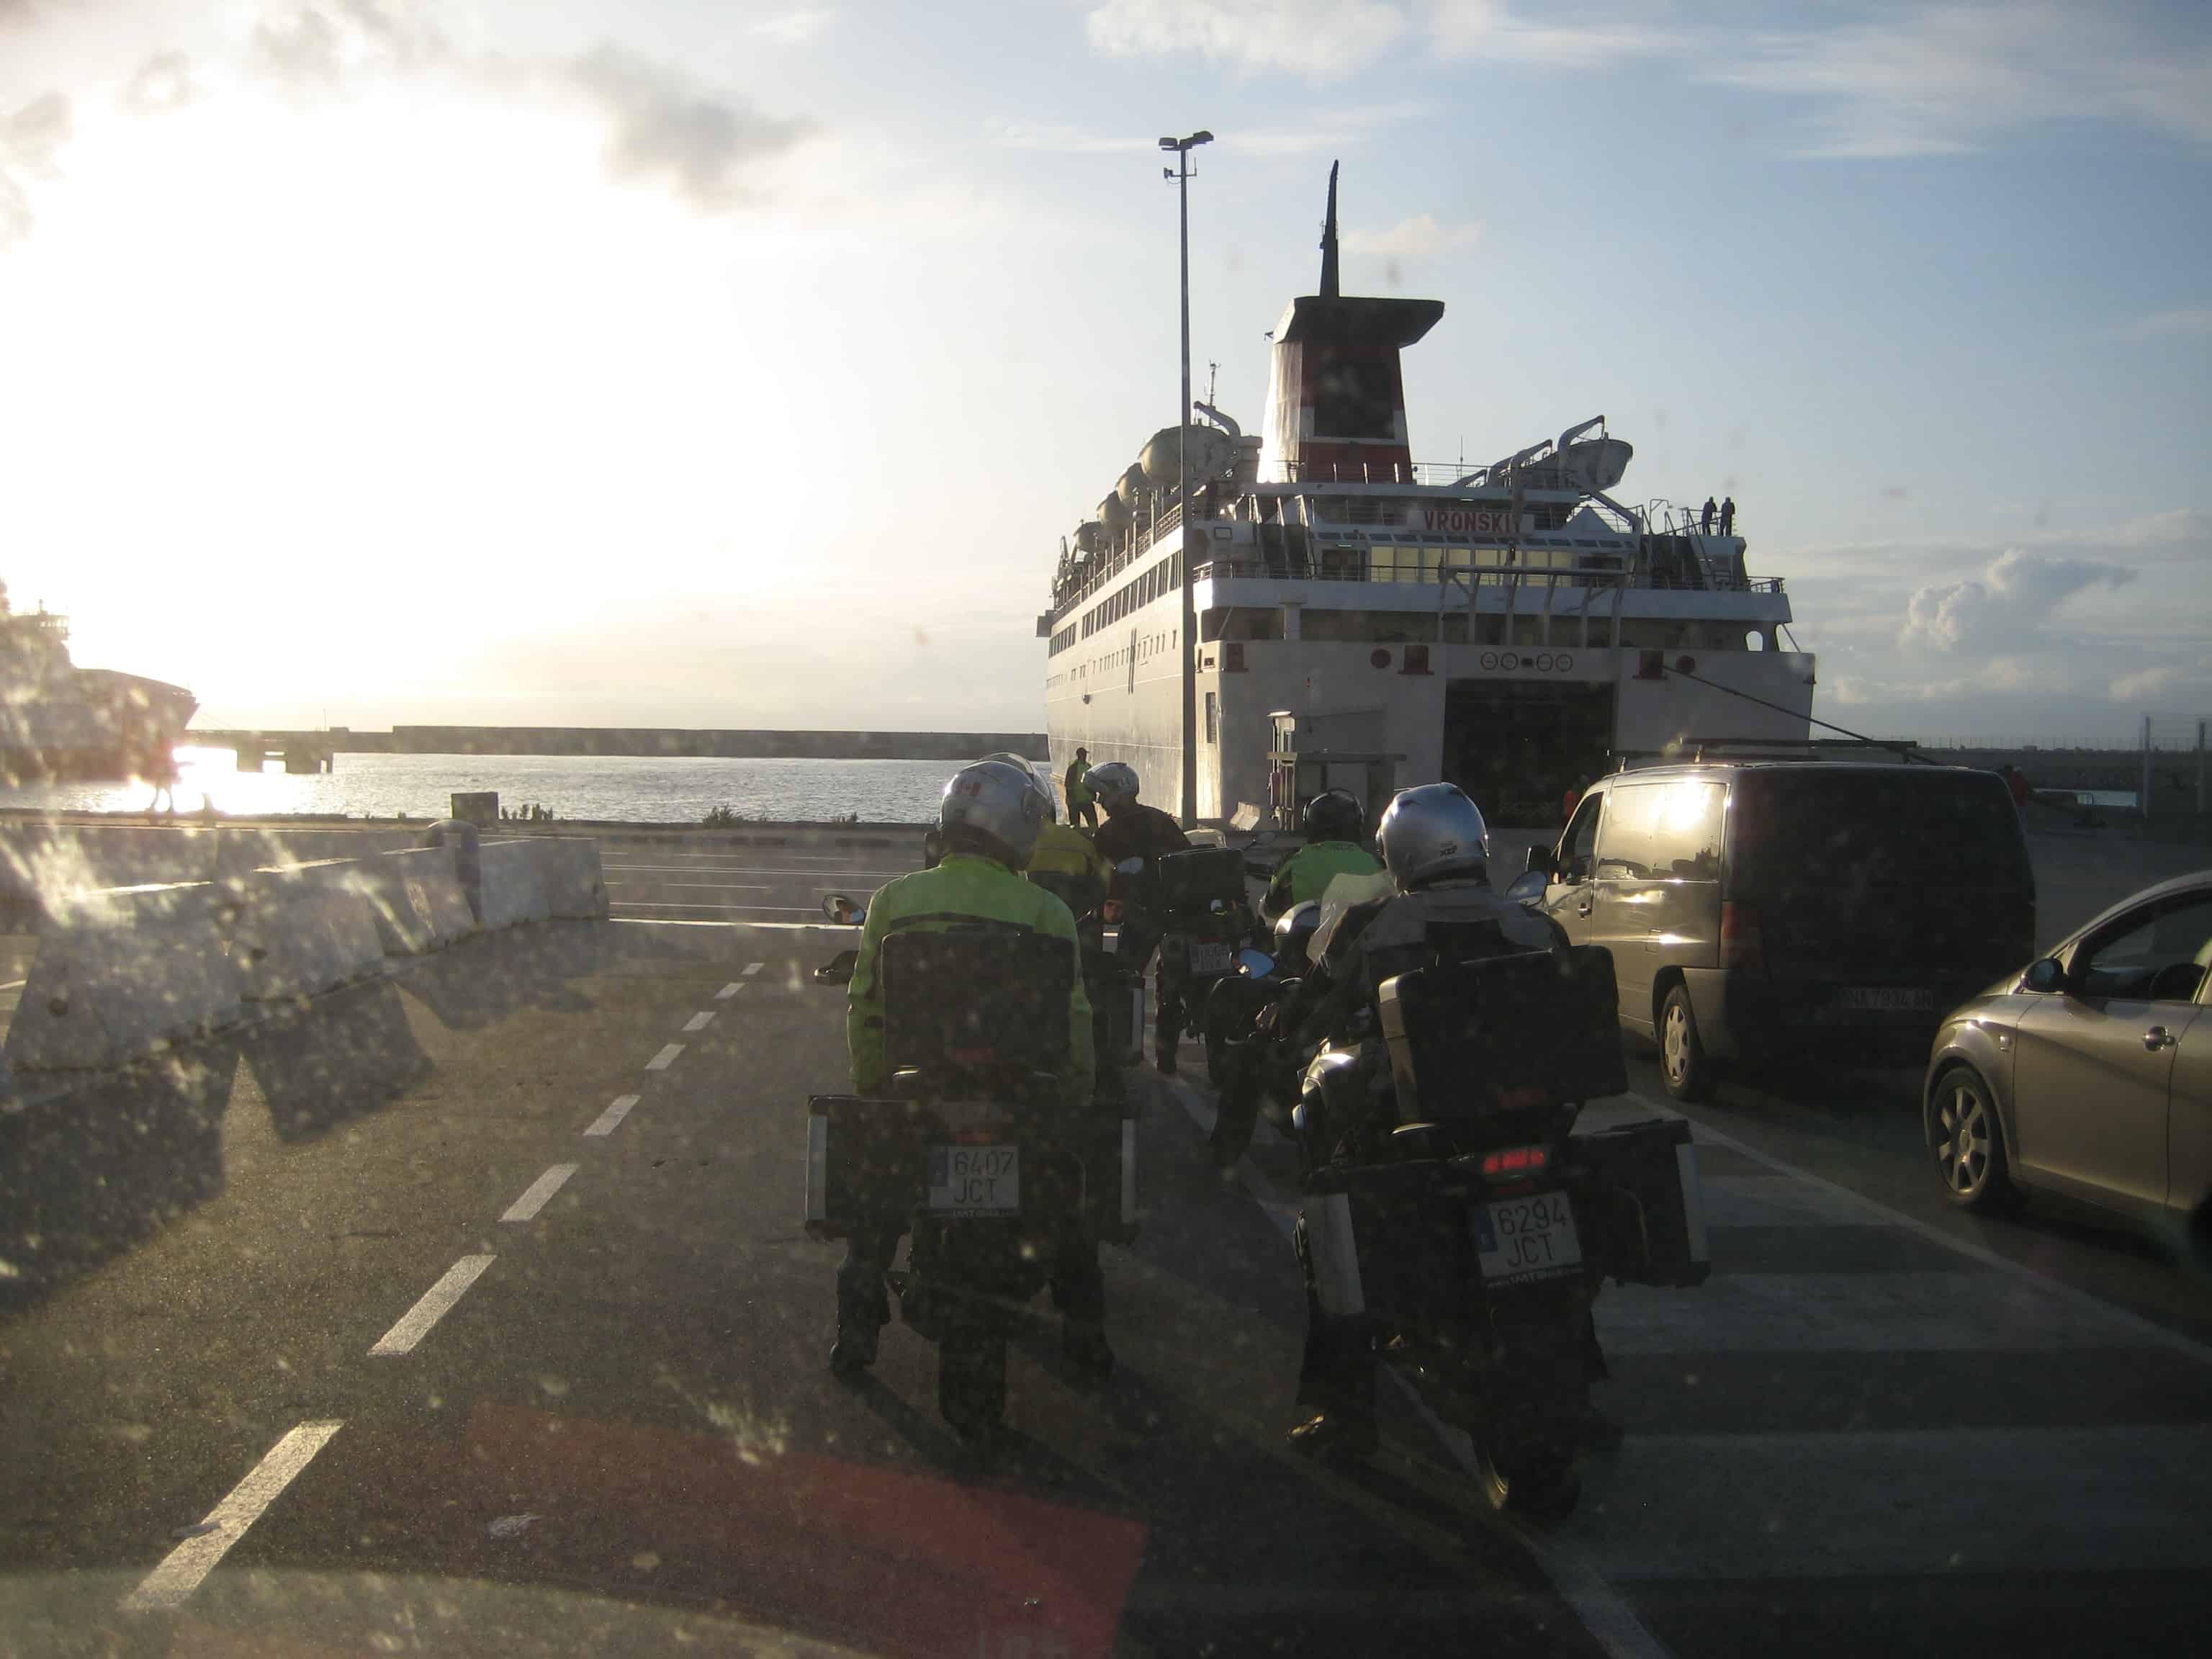 Barcelona - ferry to Sardinia